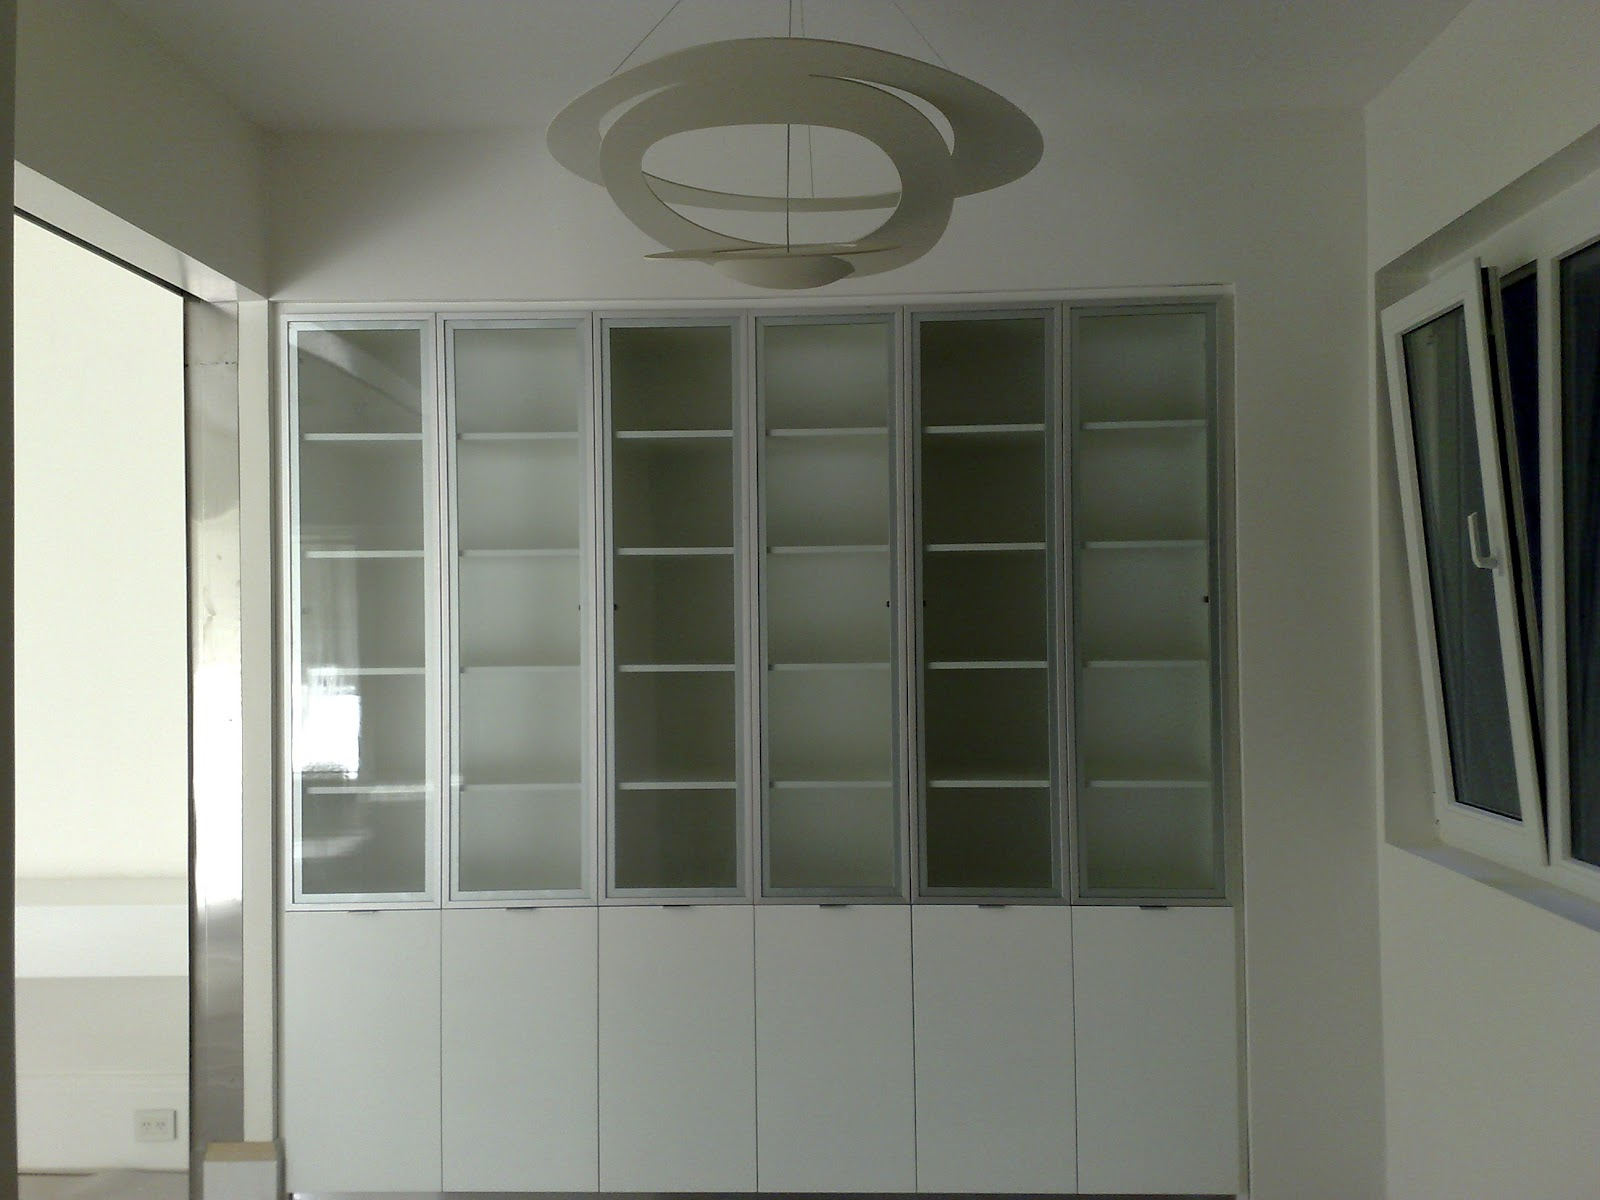 Amoblamientos cj modular en melamina blanca con puertas for Puertas de melamina